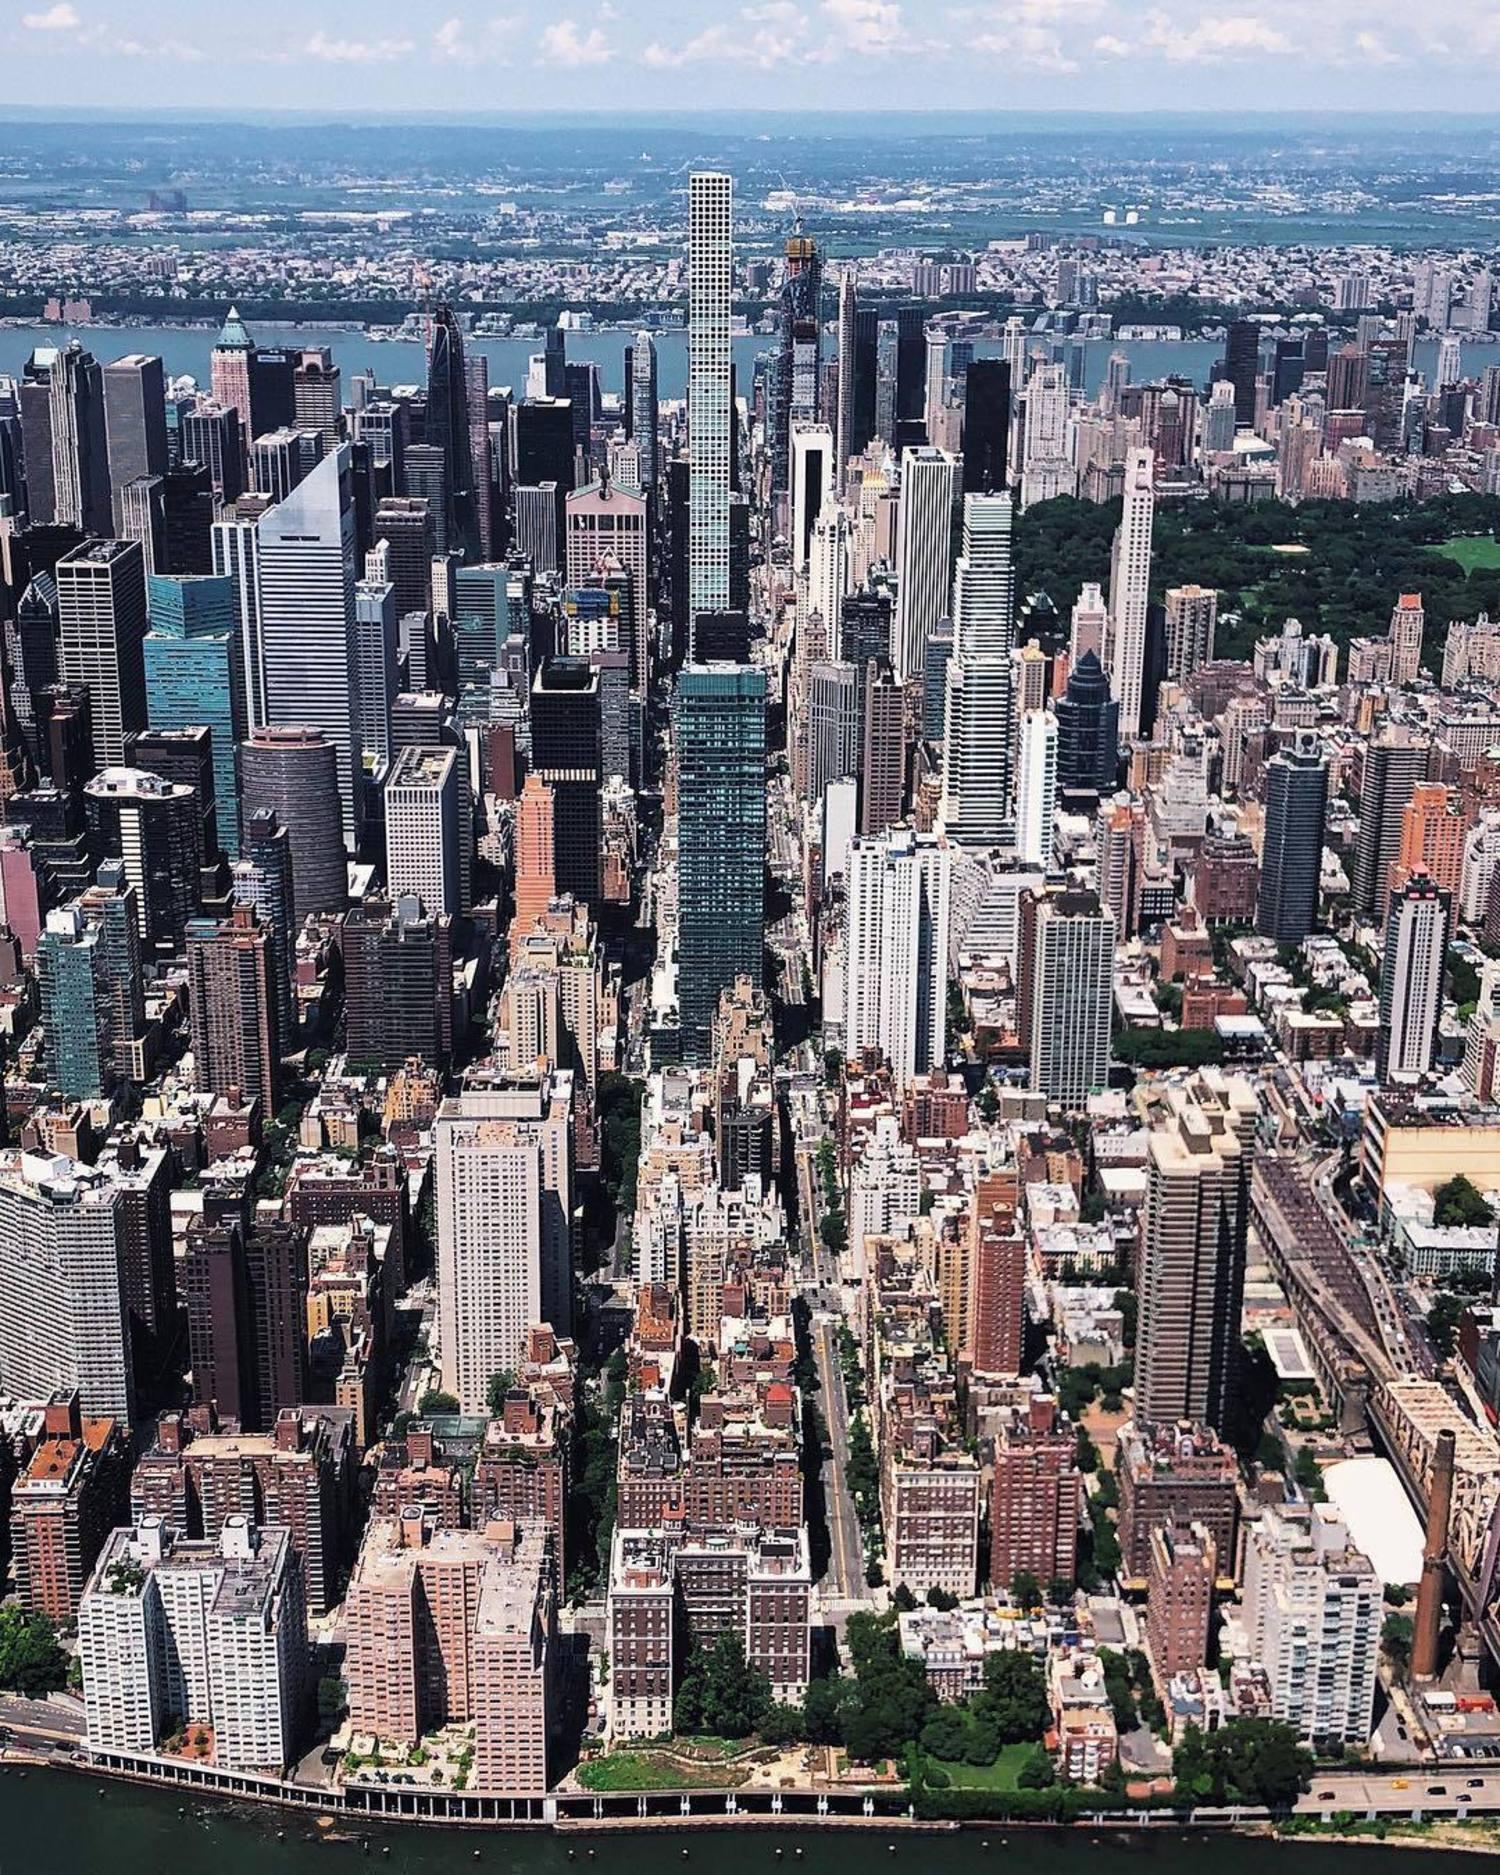 New York, New York. Photo via @melliekr #viewingnyc #newyork #newyorkcity #nyc